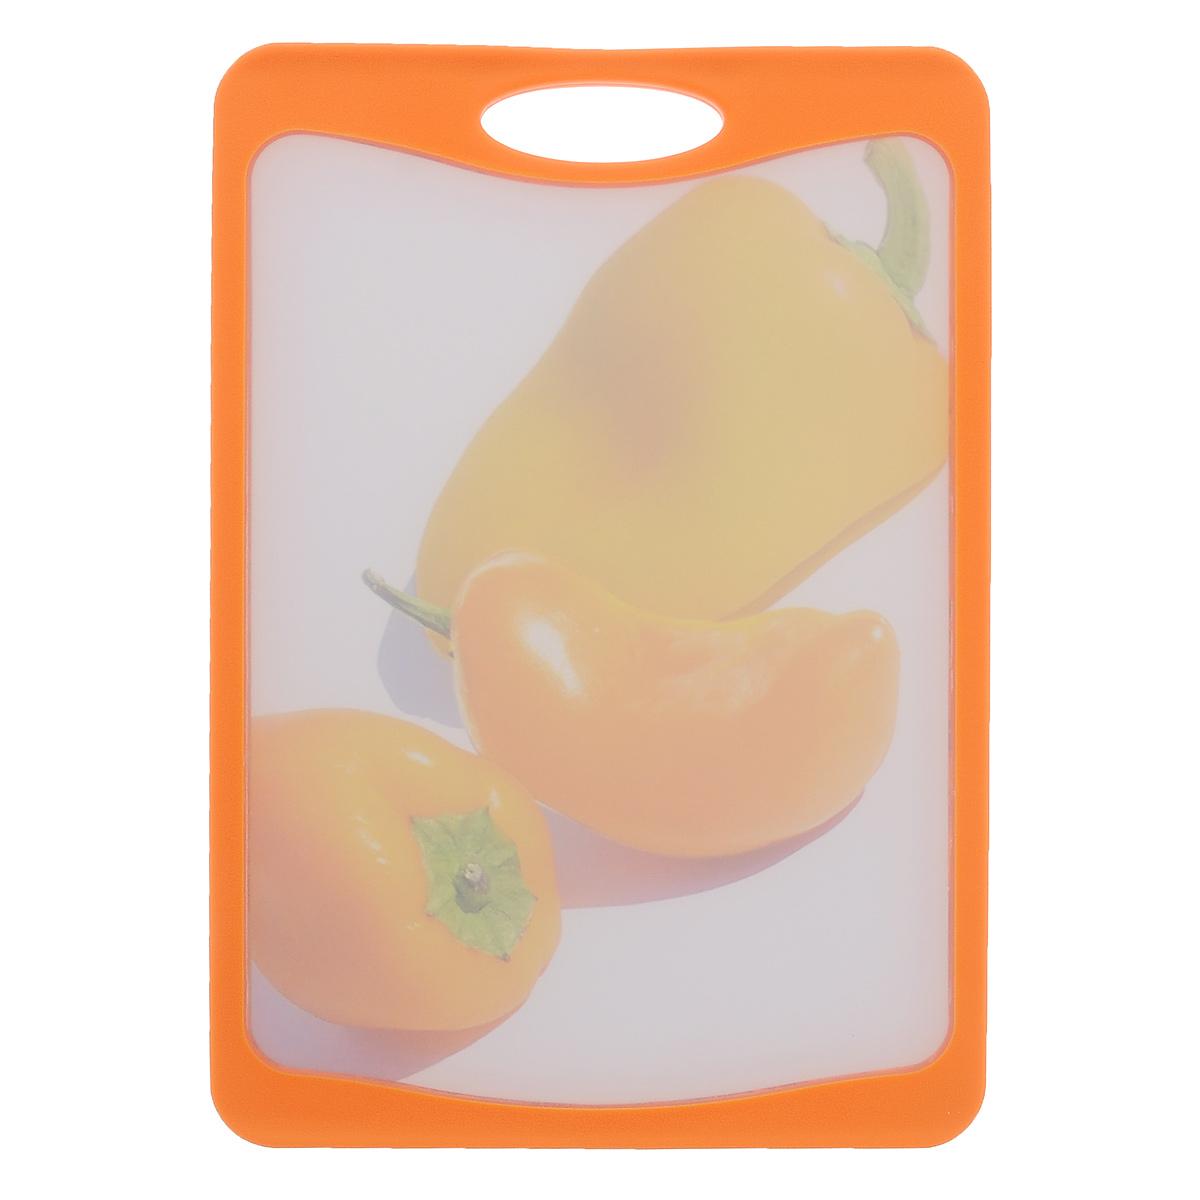 "Доска разделочная Frybest ""Паприка"", цвет: оранжевый, 20 х 29 см"